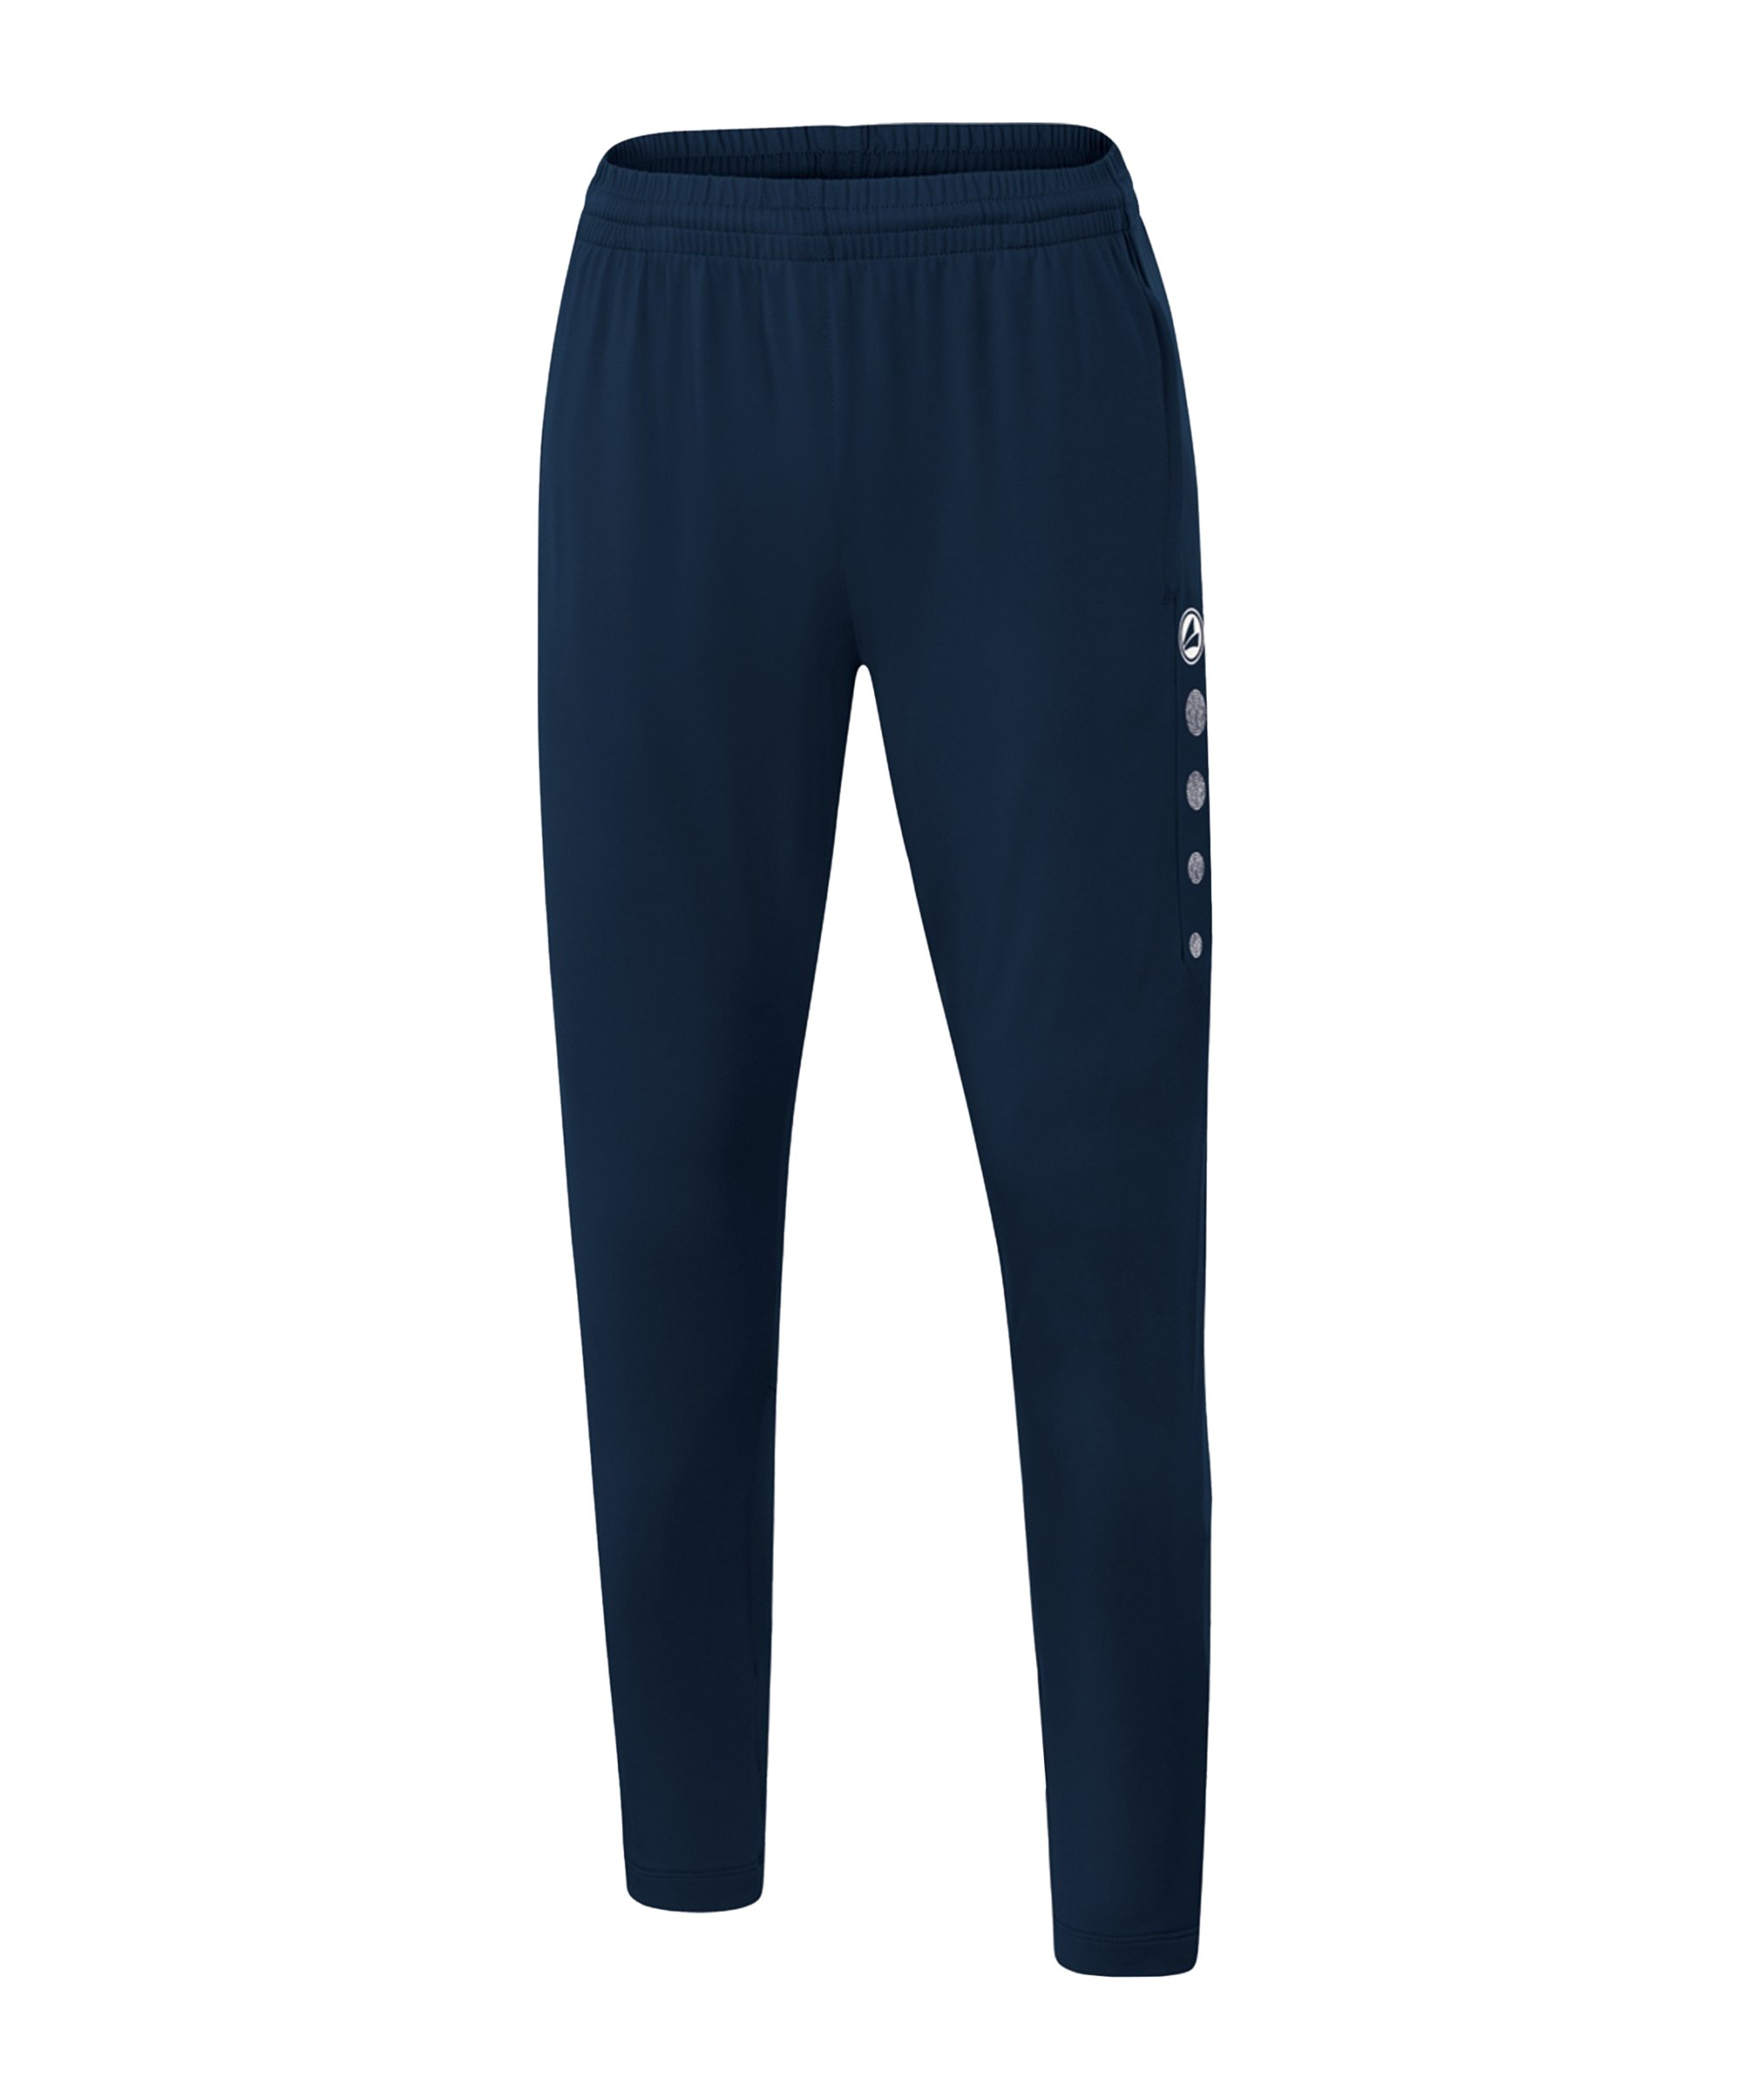 JAKO Premium Trainingshose Damen Blau F09 - blau